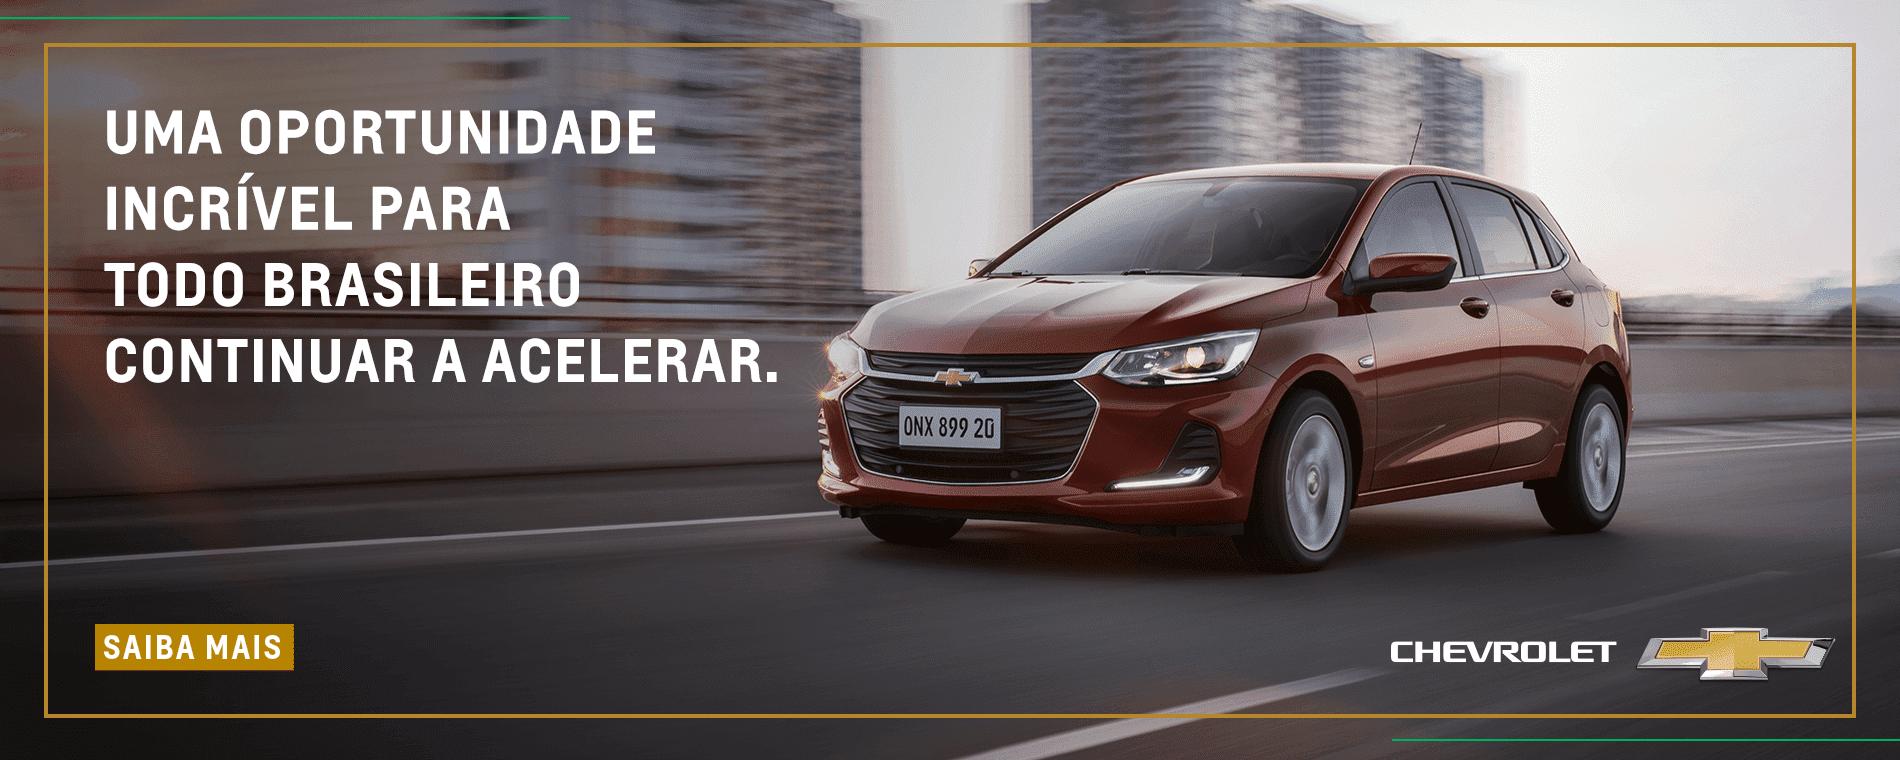 Oportunidade Chevrolet